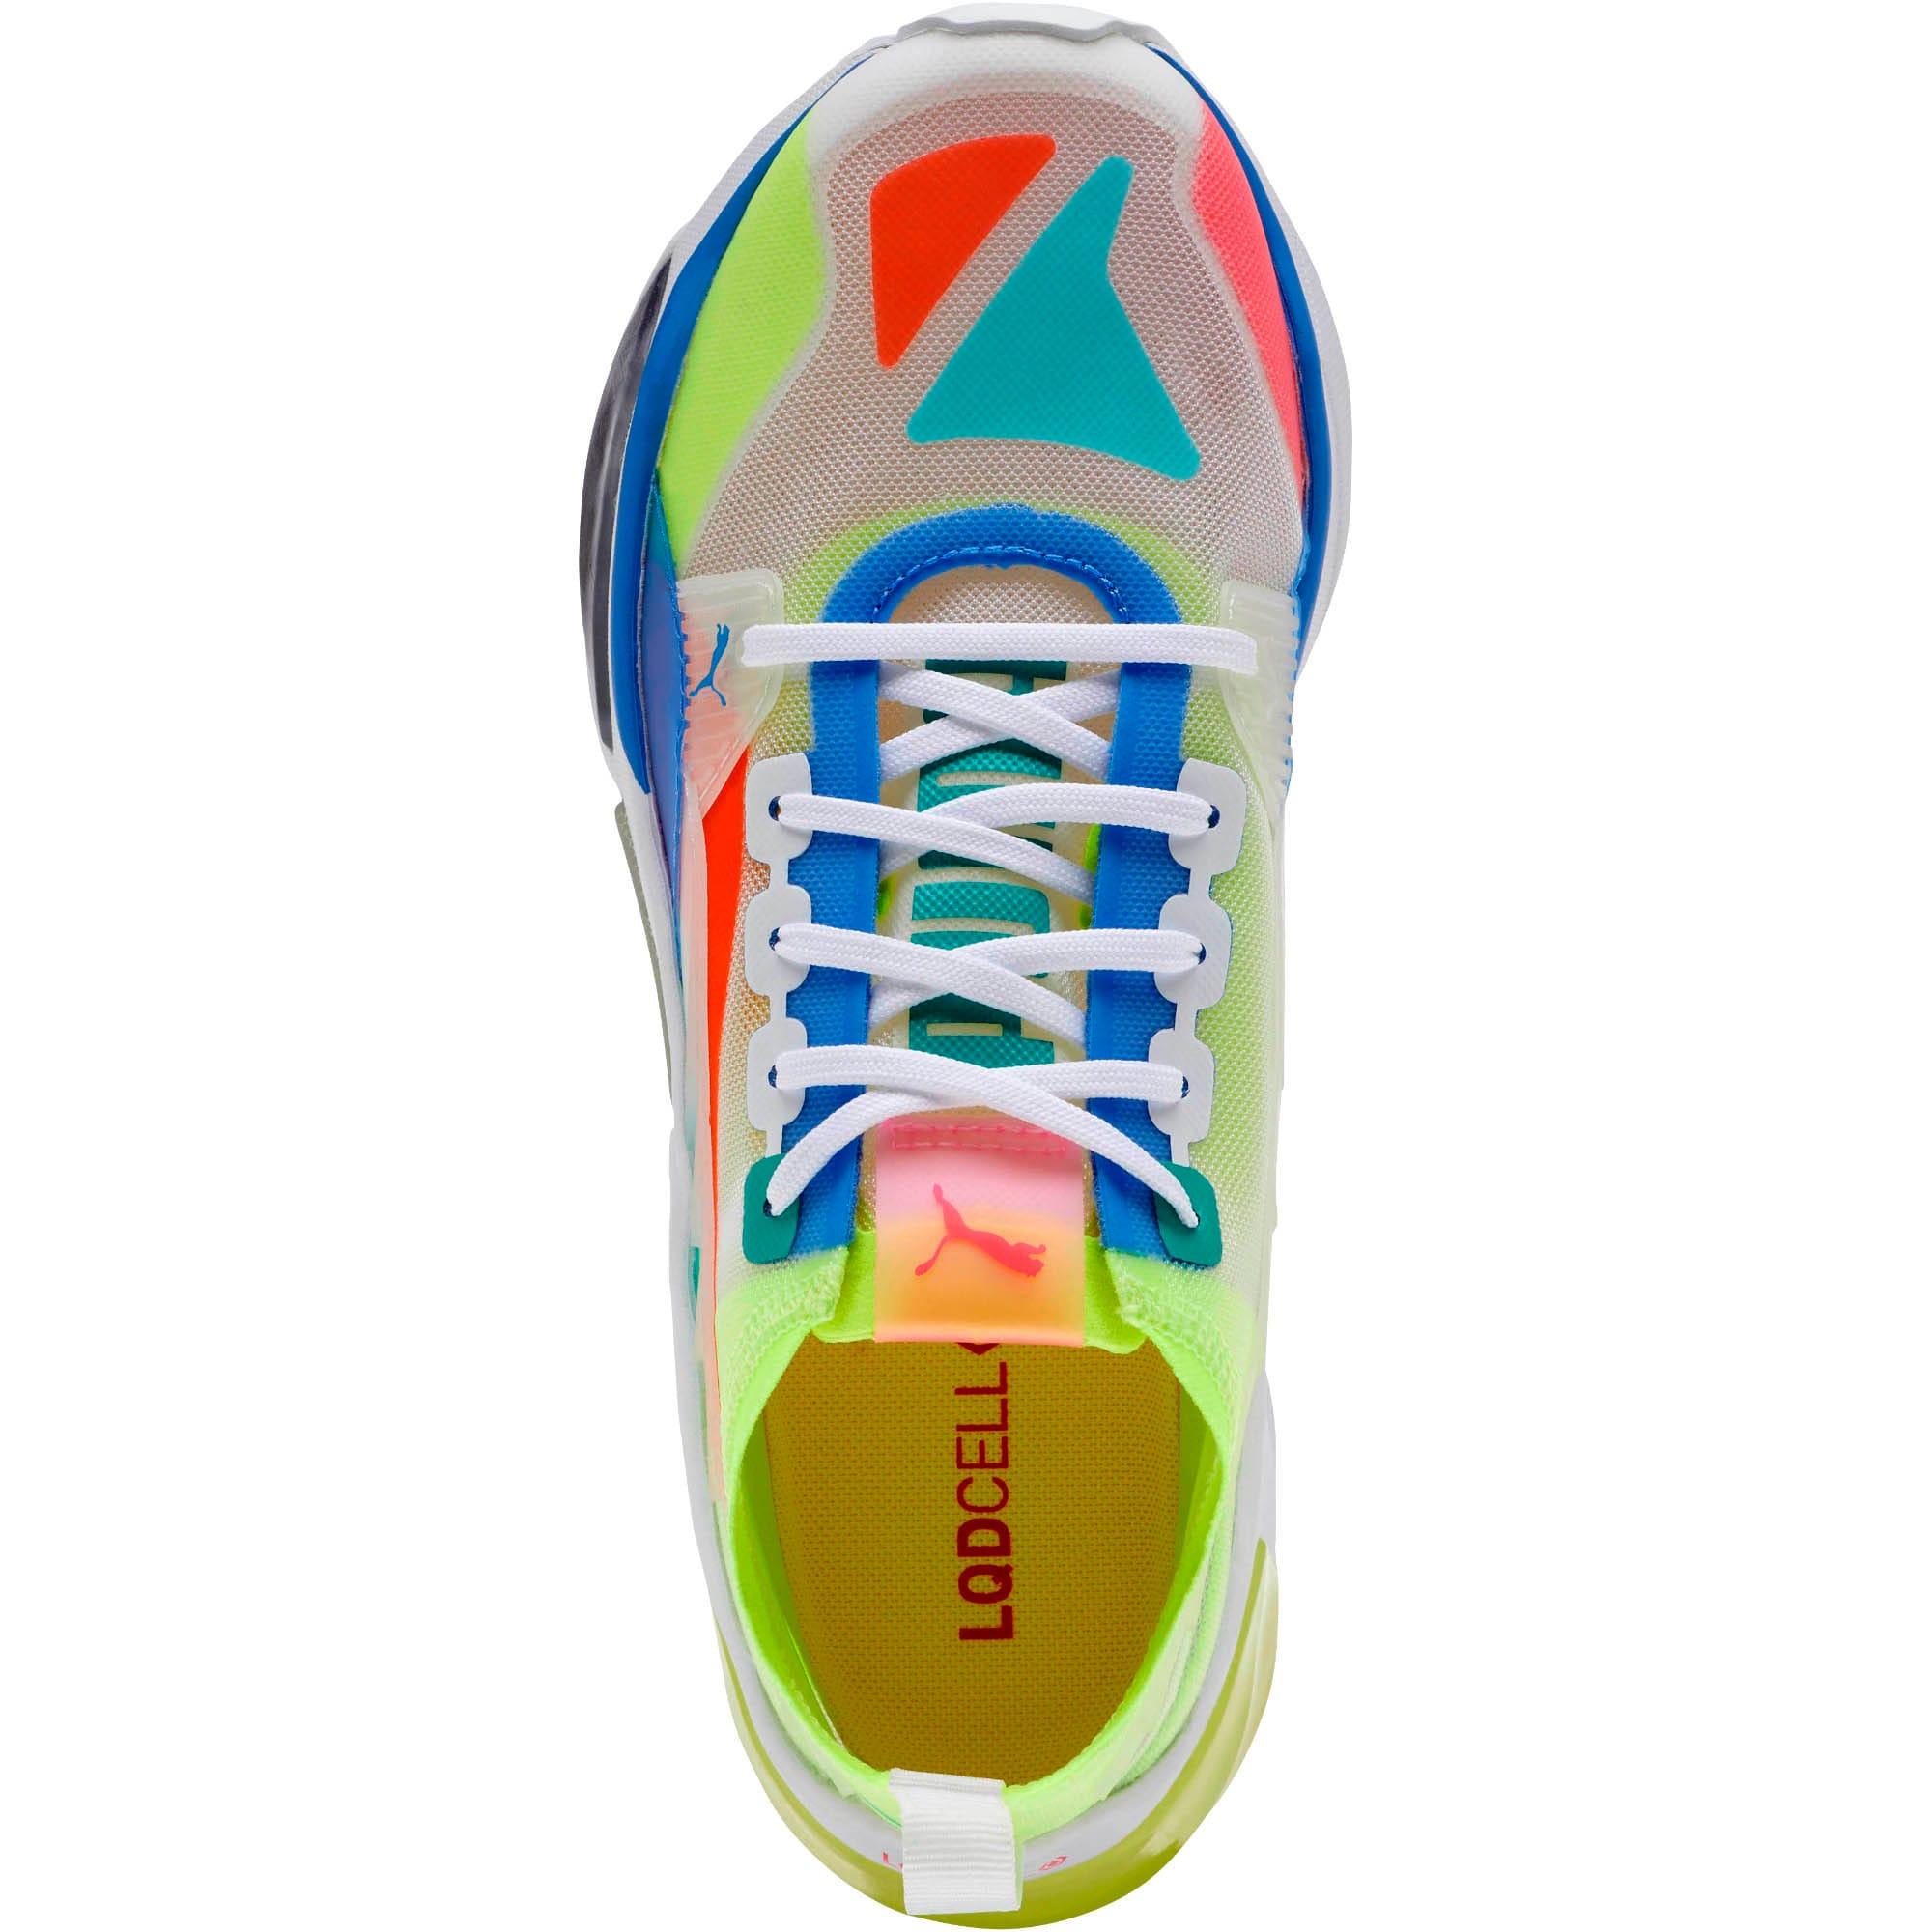 Thumbnail 5 of LQDCELL Optic Sheer Women's Training Shoes, Puma White, medium